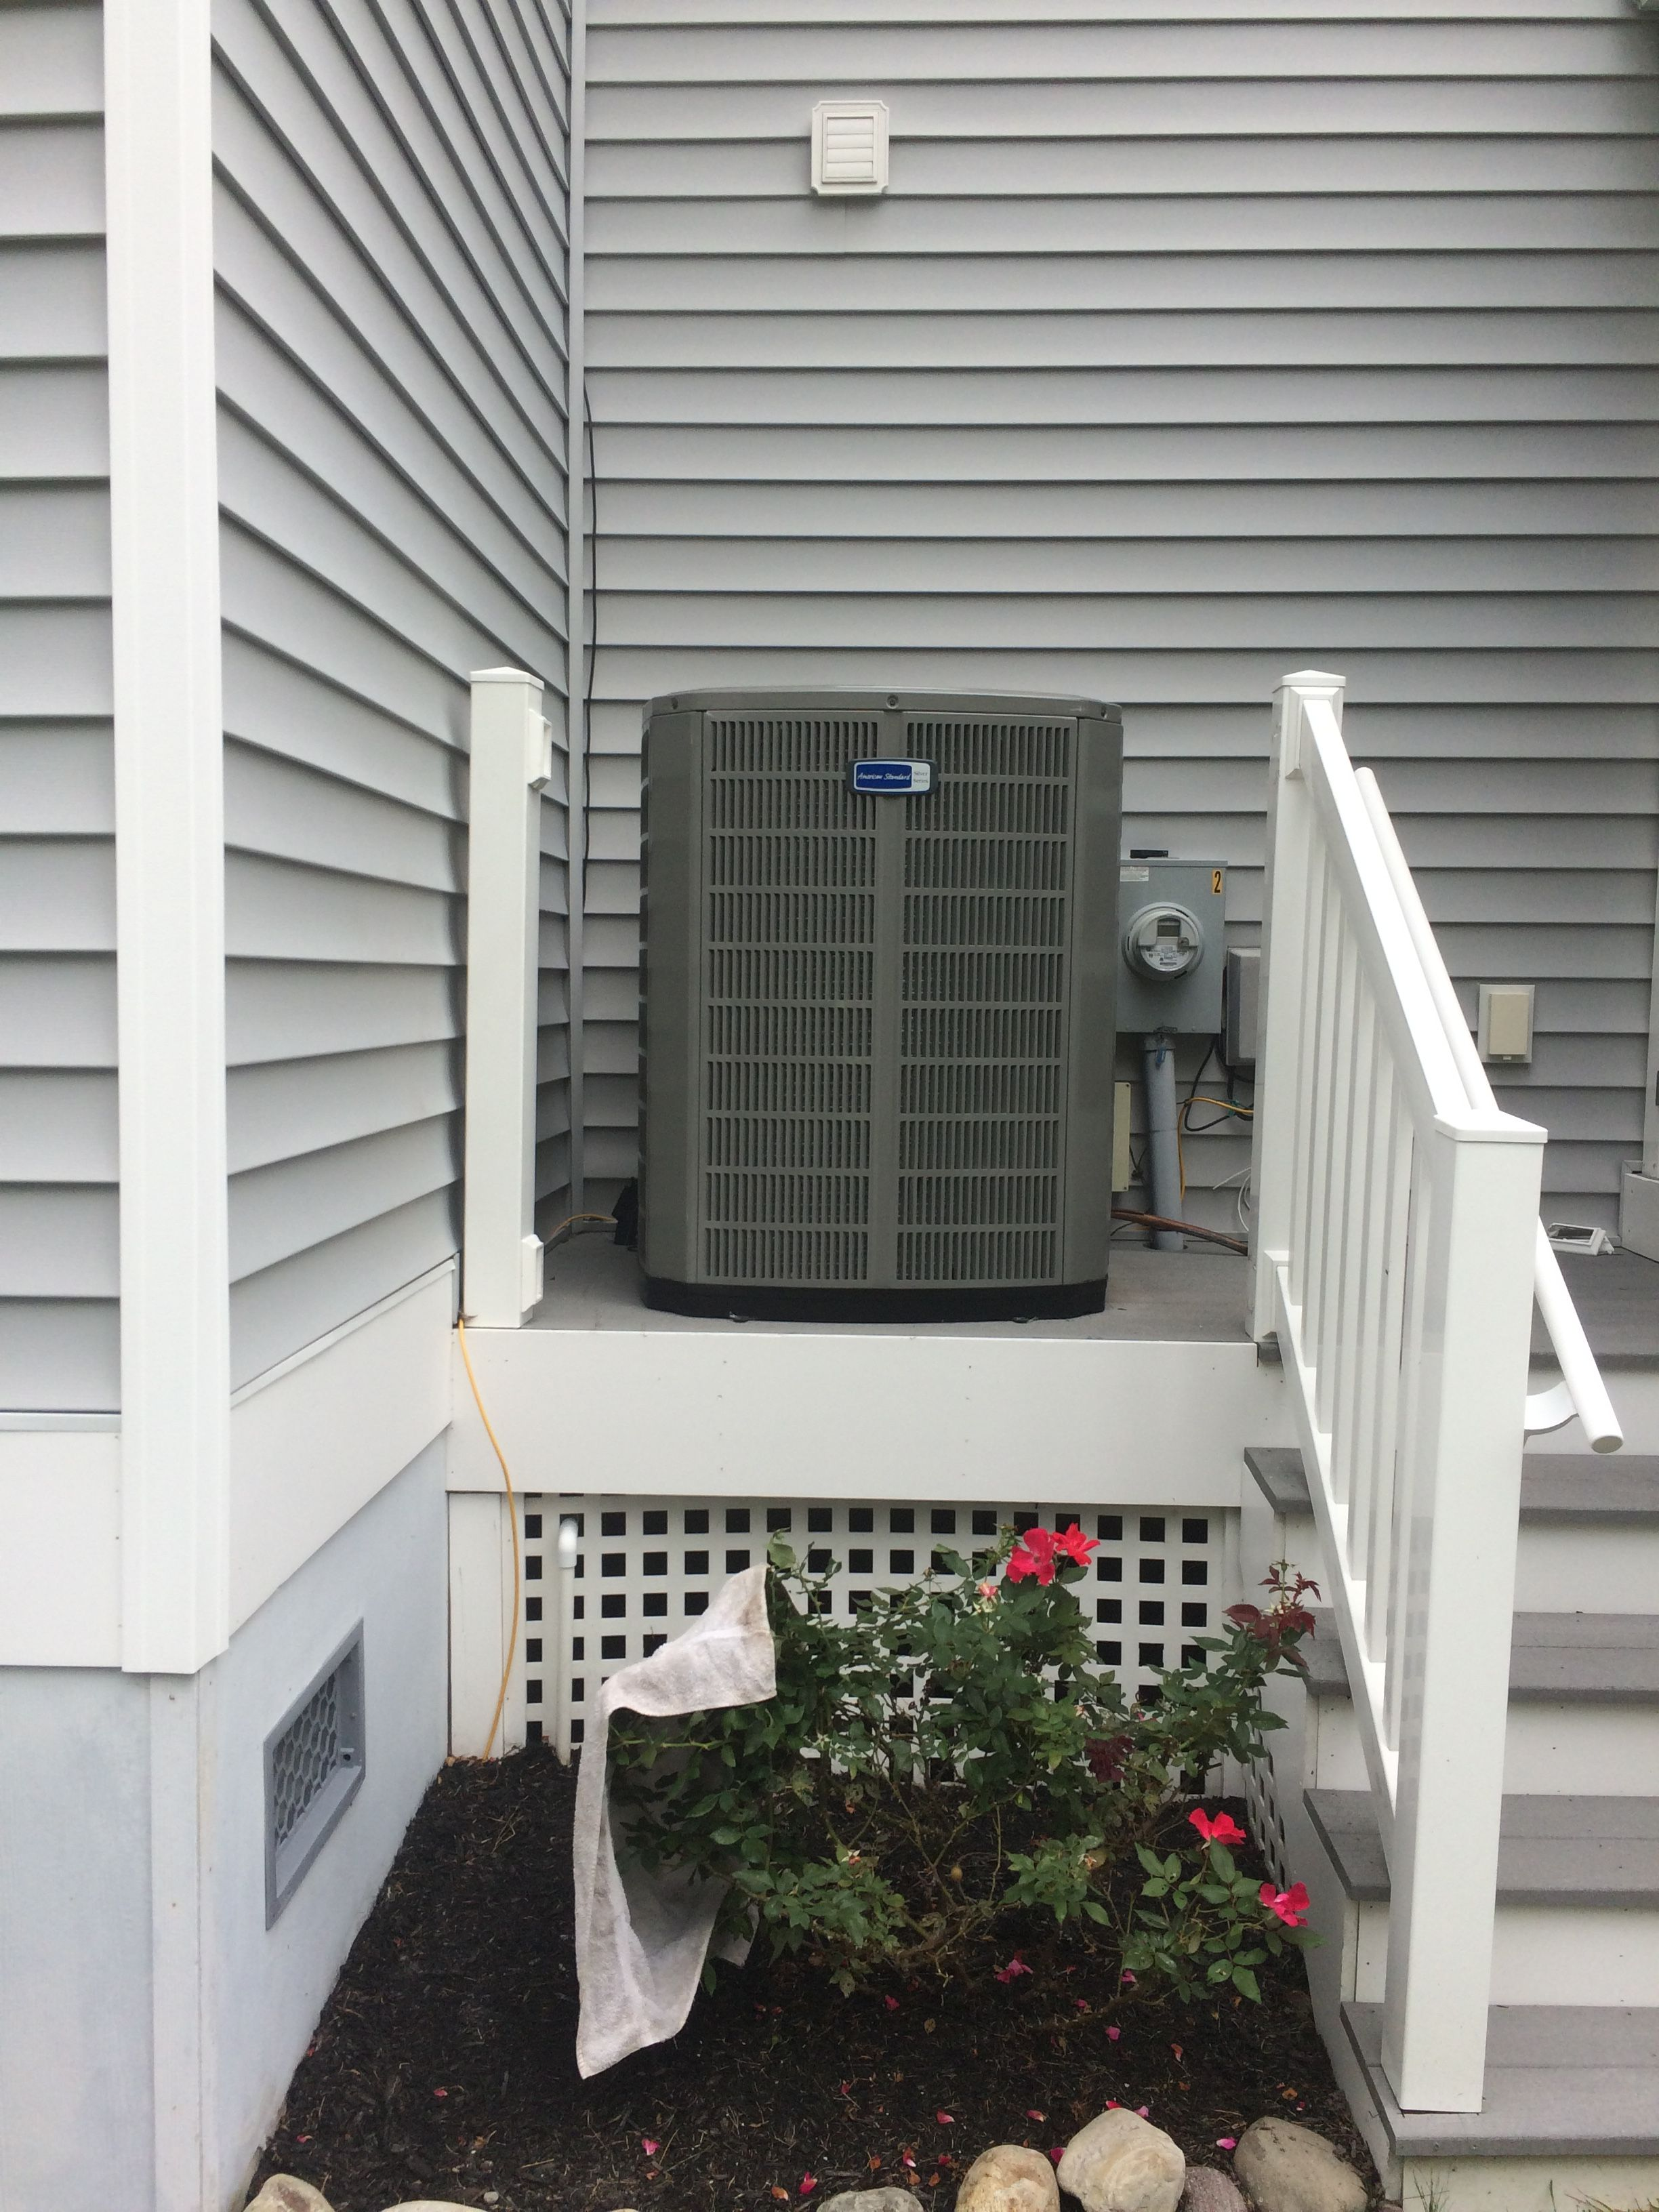 American standard heat pump Air heating, Outdoor